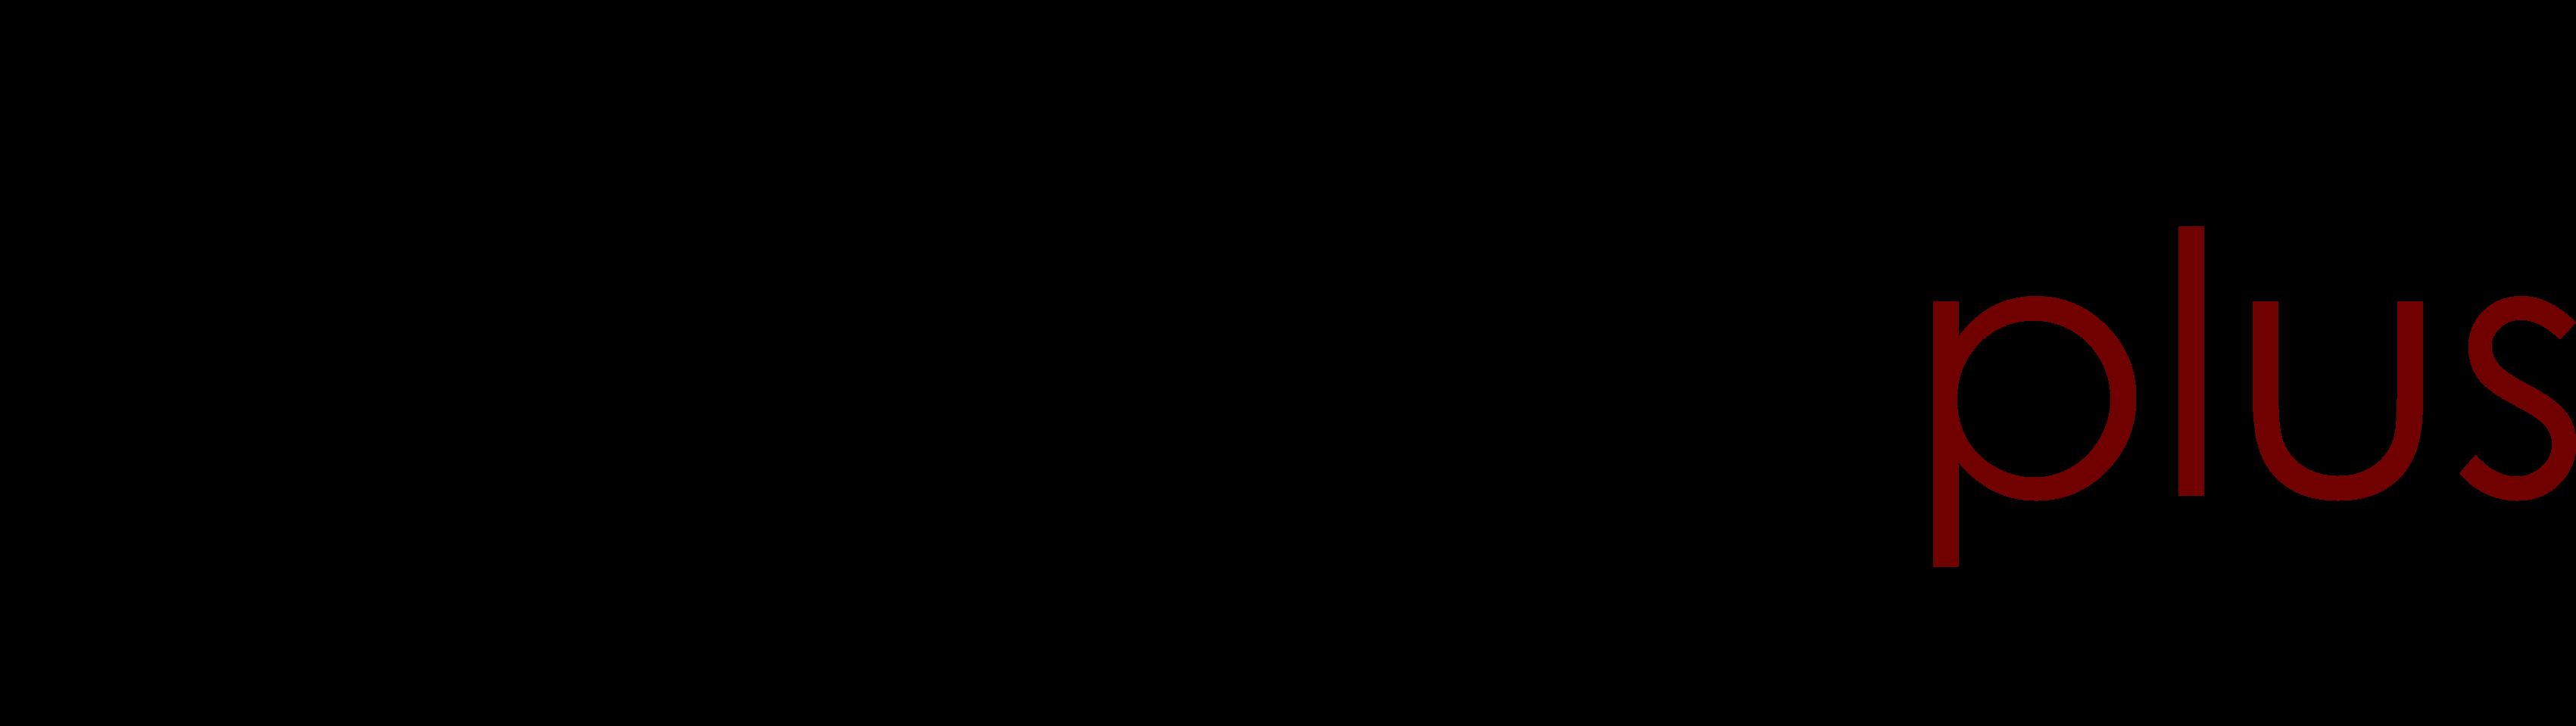 g4167